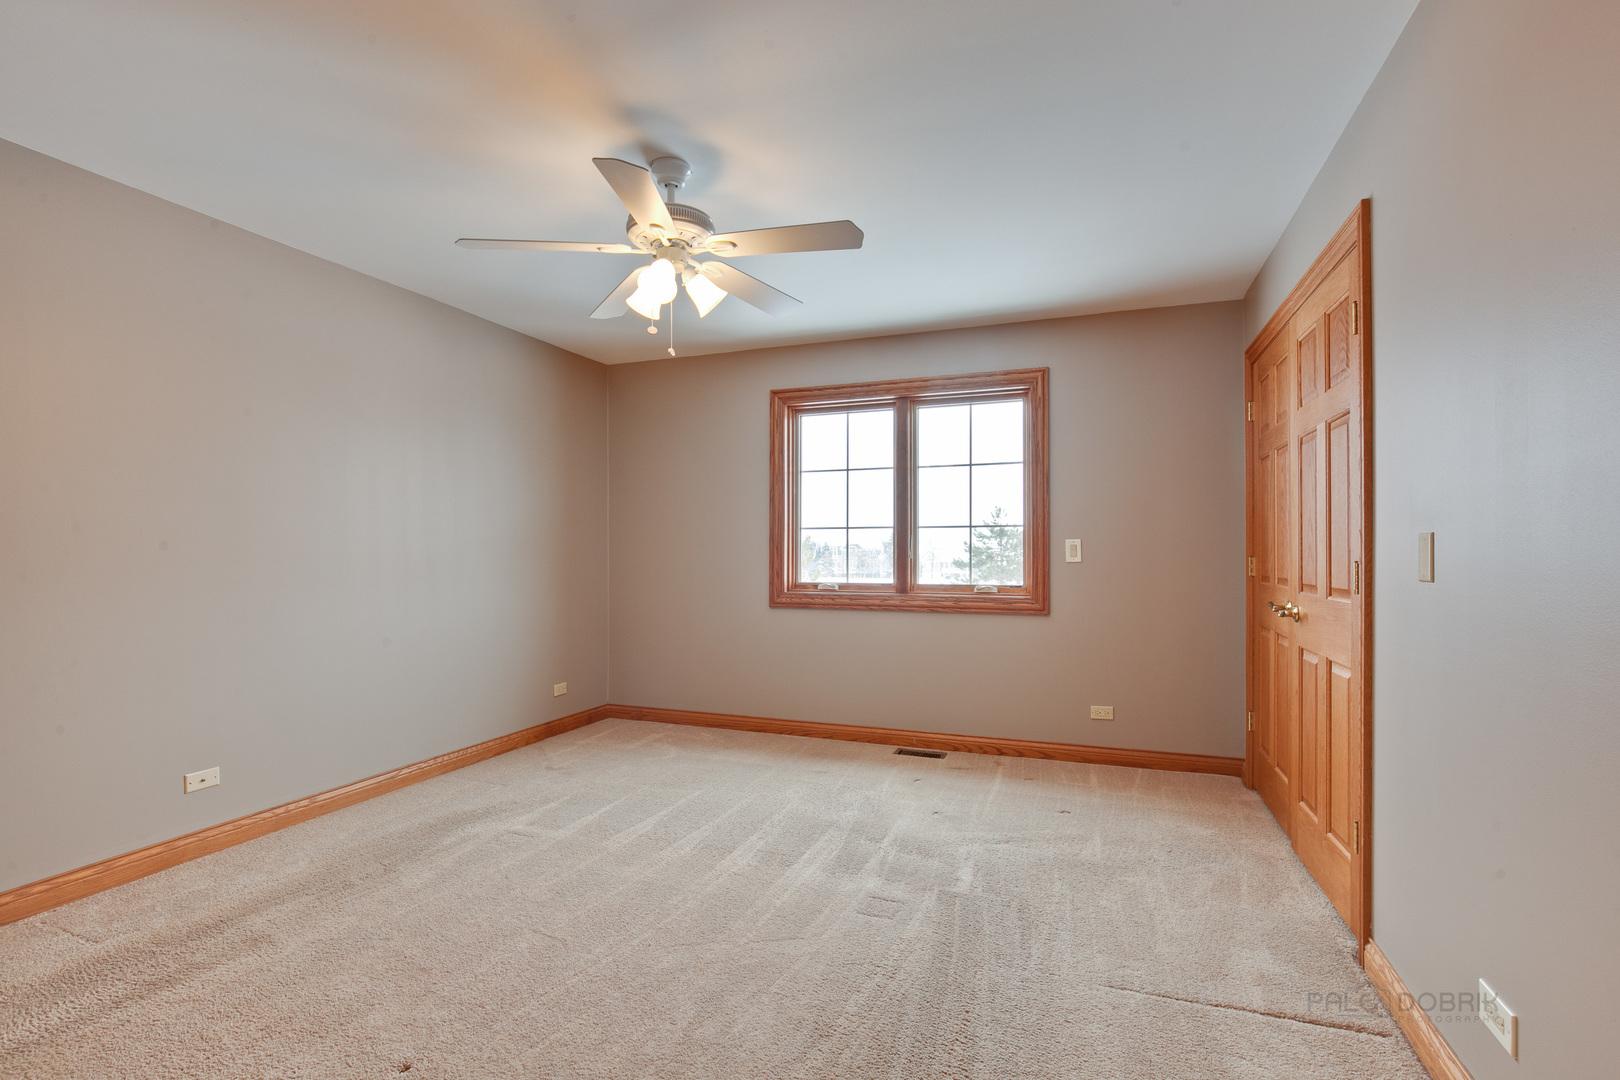 1 South PIERMONT, North Barrington, Illinois, 60010